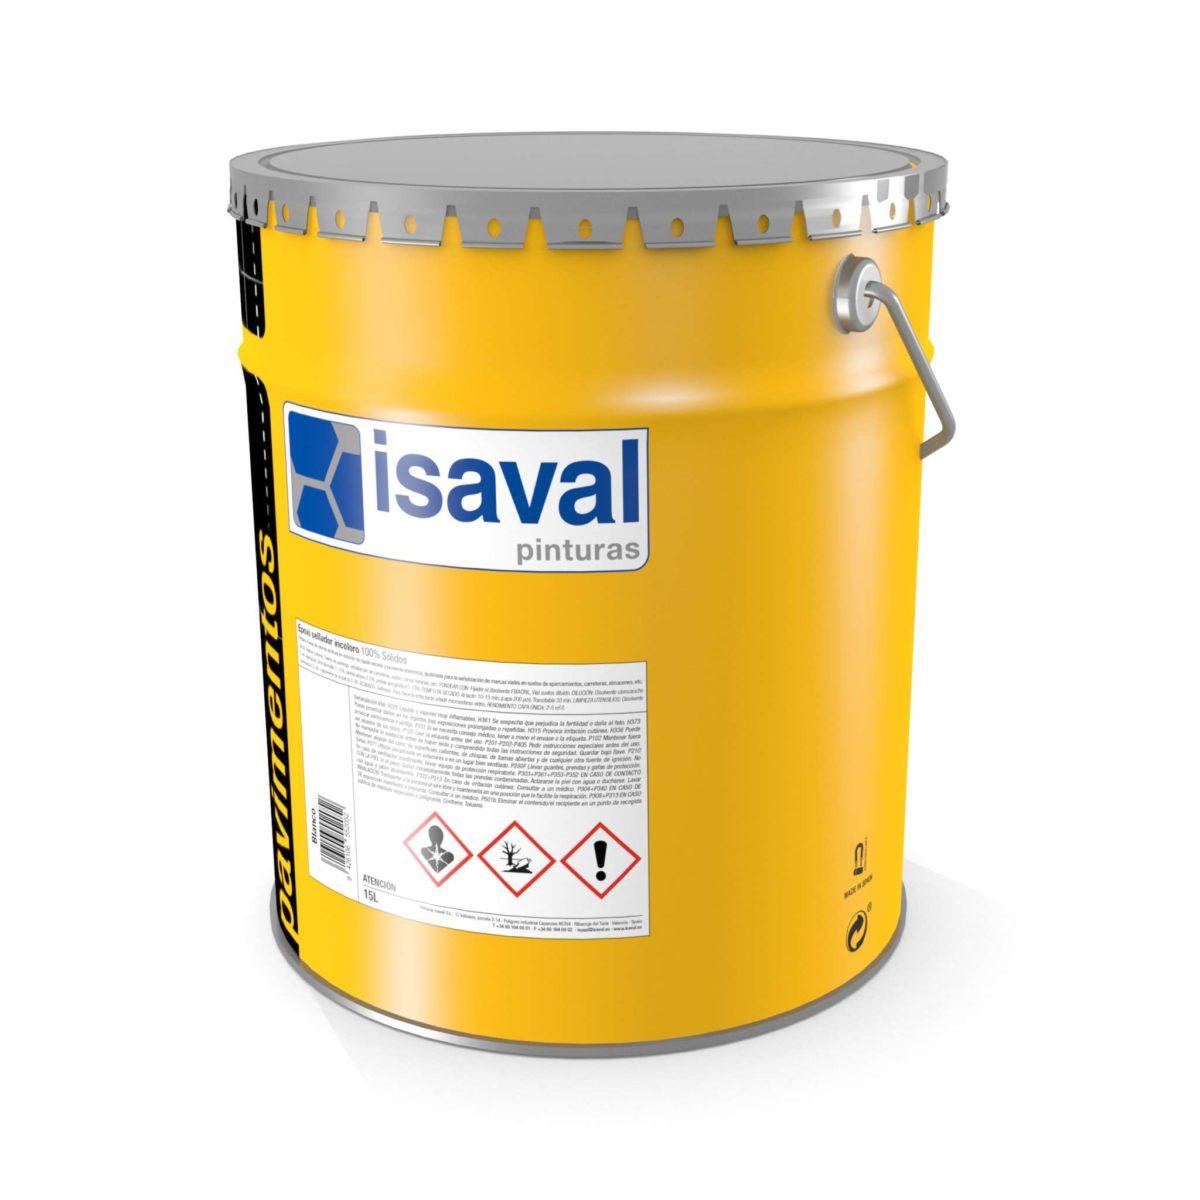 Exposi sellador incoloro 100% sólidos. Imprimación exposi incolora sin dte. de Pinturas Isaval